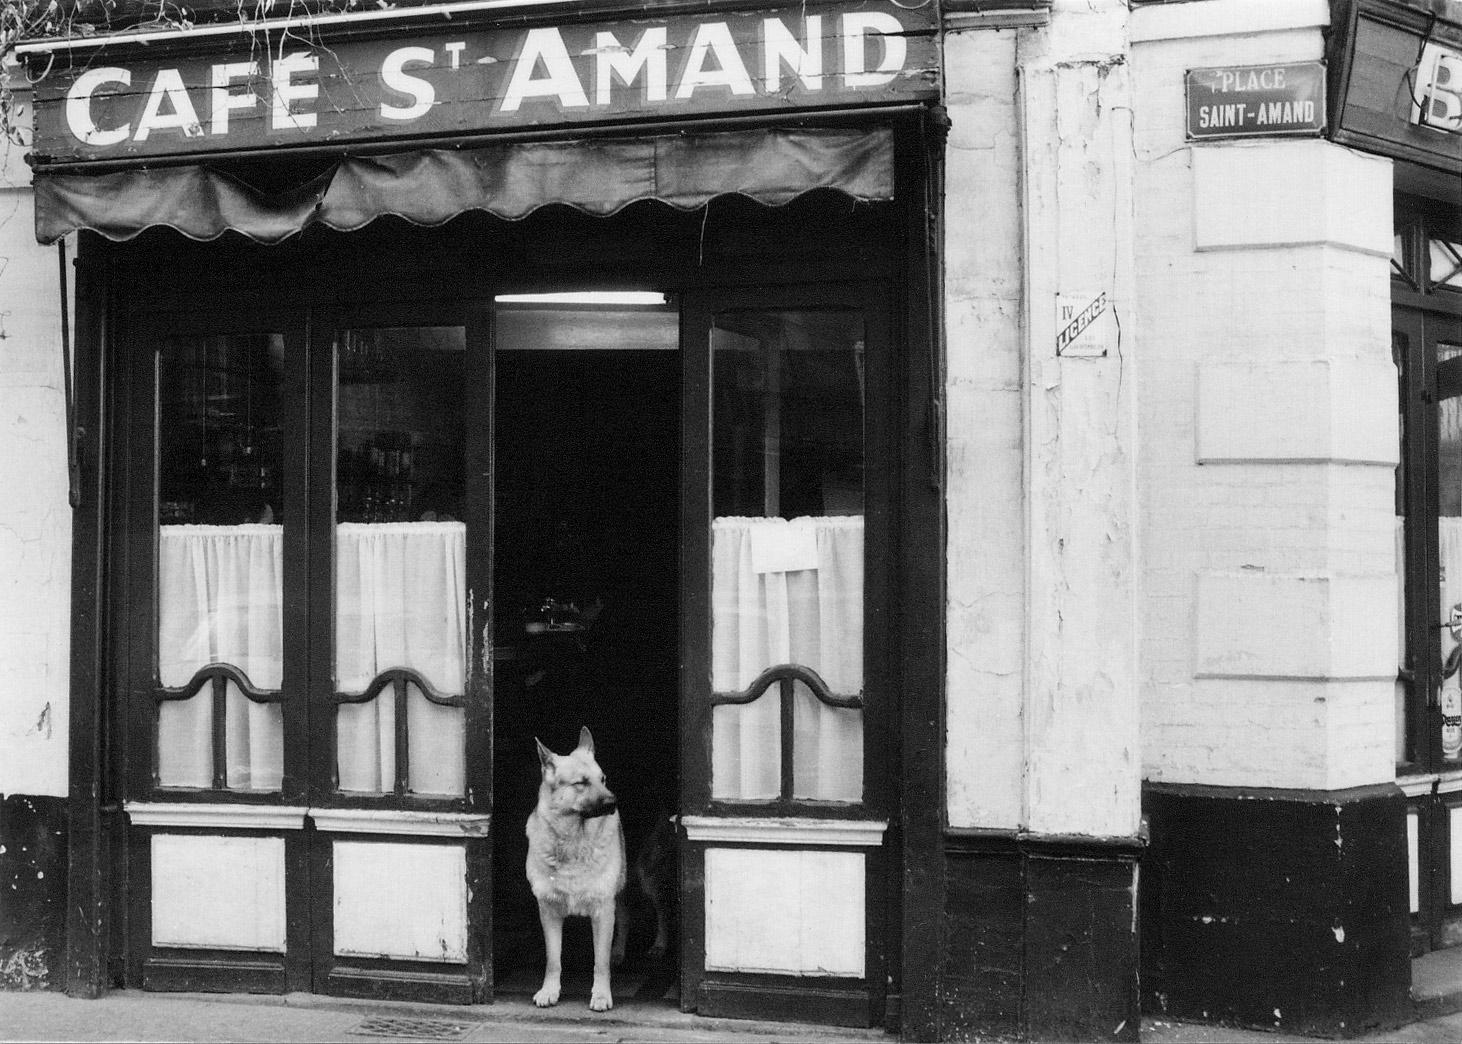 Caf Seine Saint Denis Pairis E